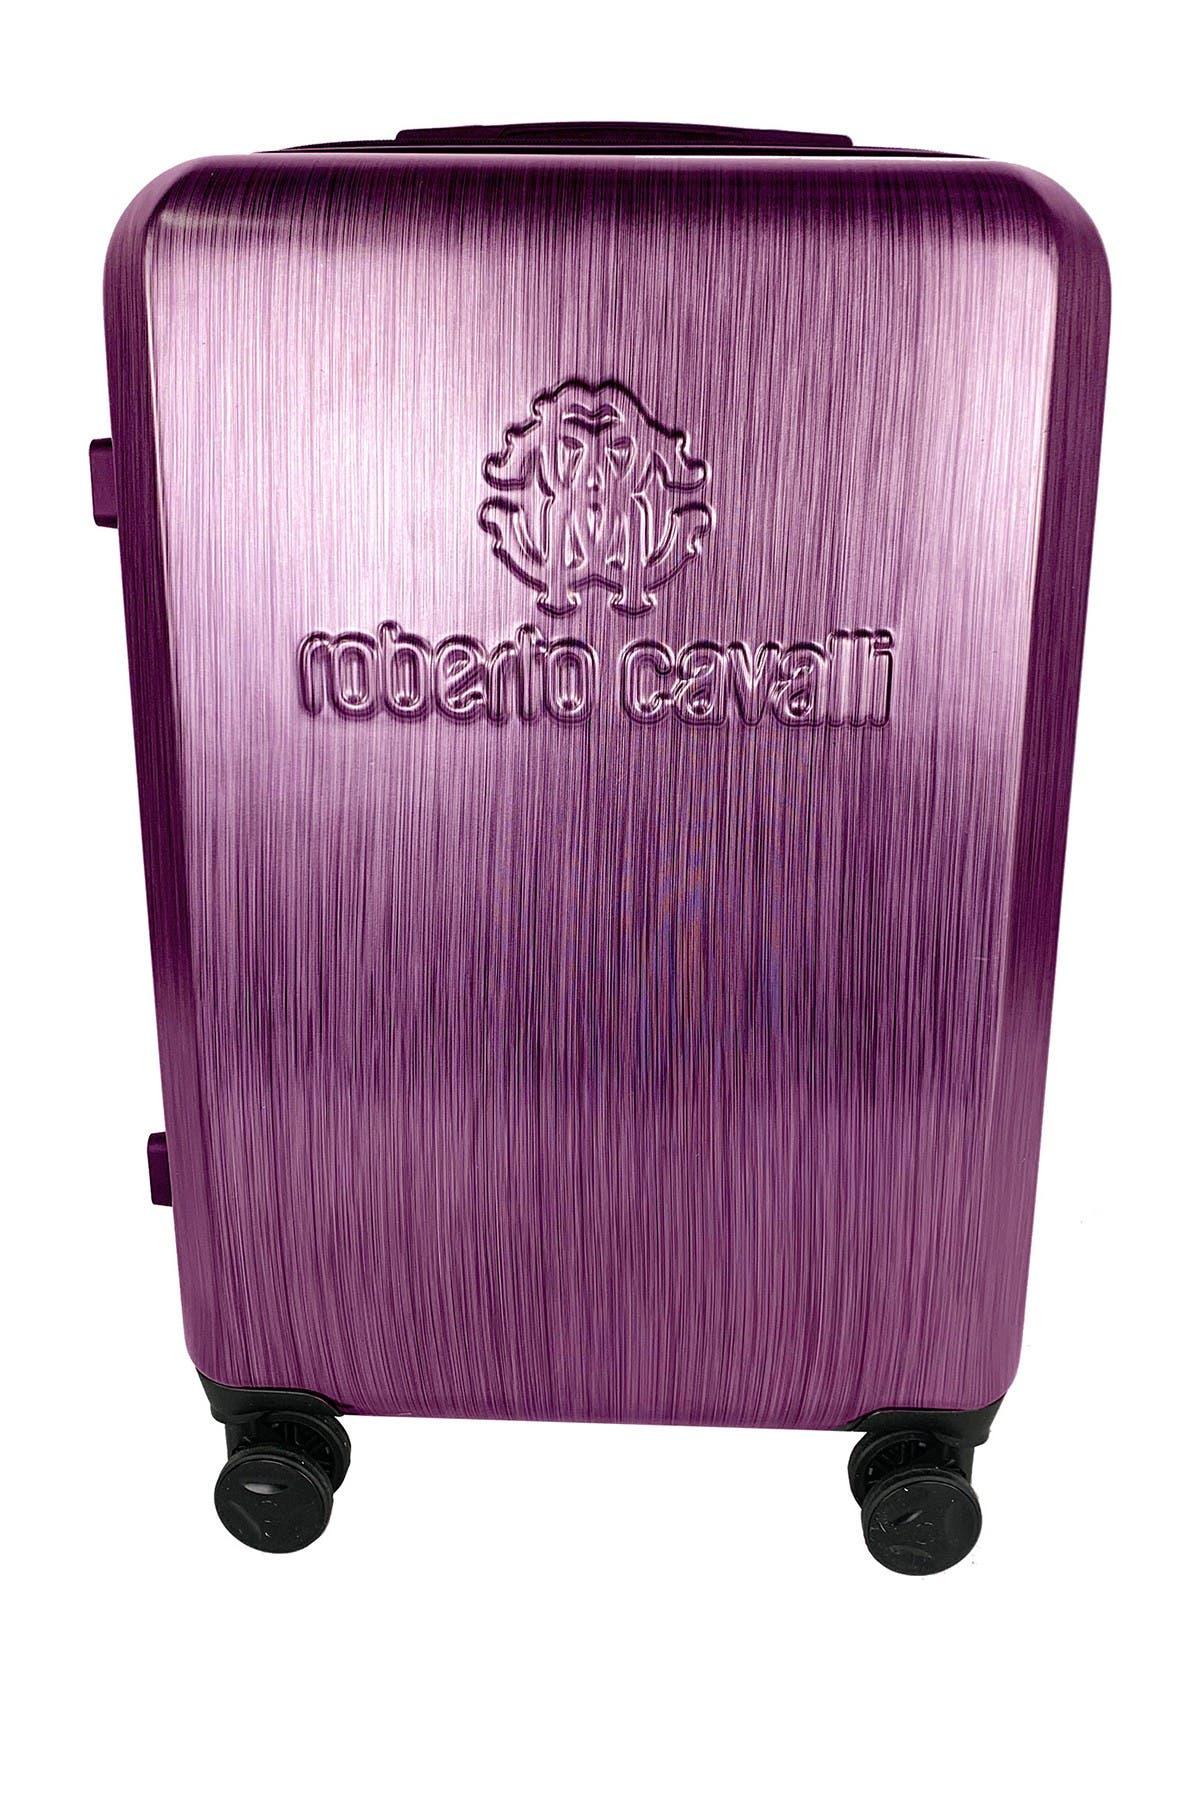 "Image of Roberto Cavalli Woodlock 24"" Expandable Hardside Spinner Suitcase"